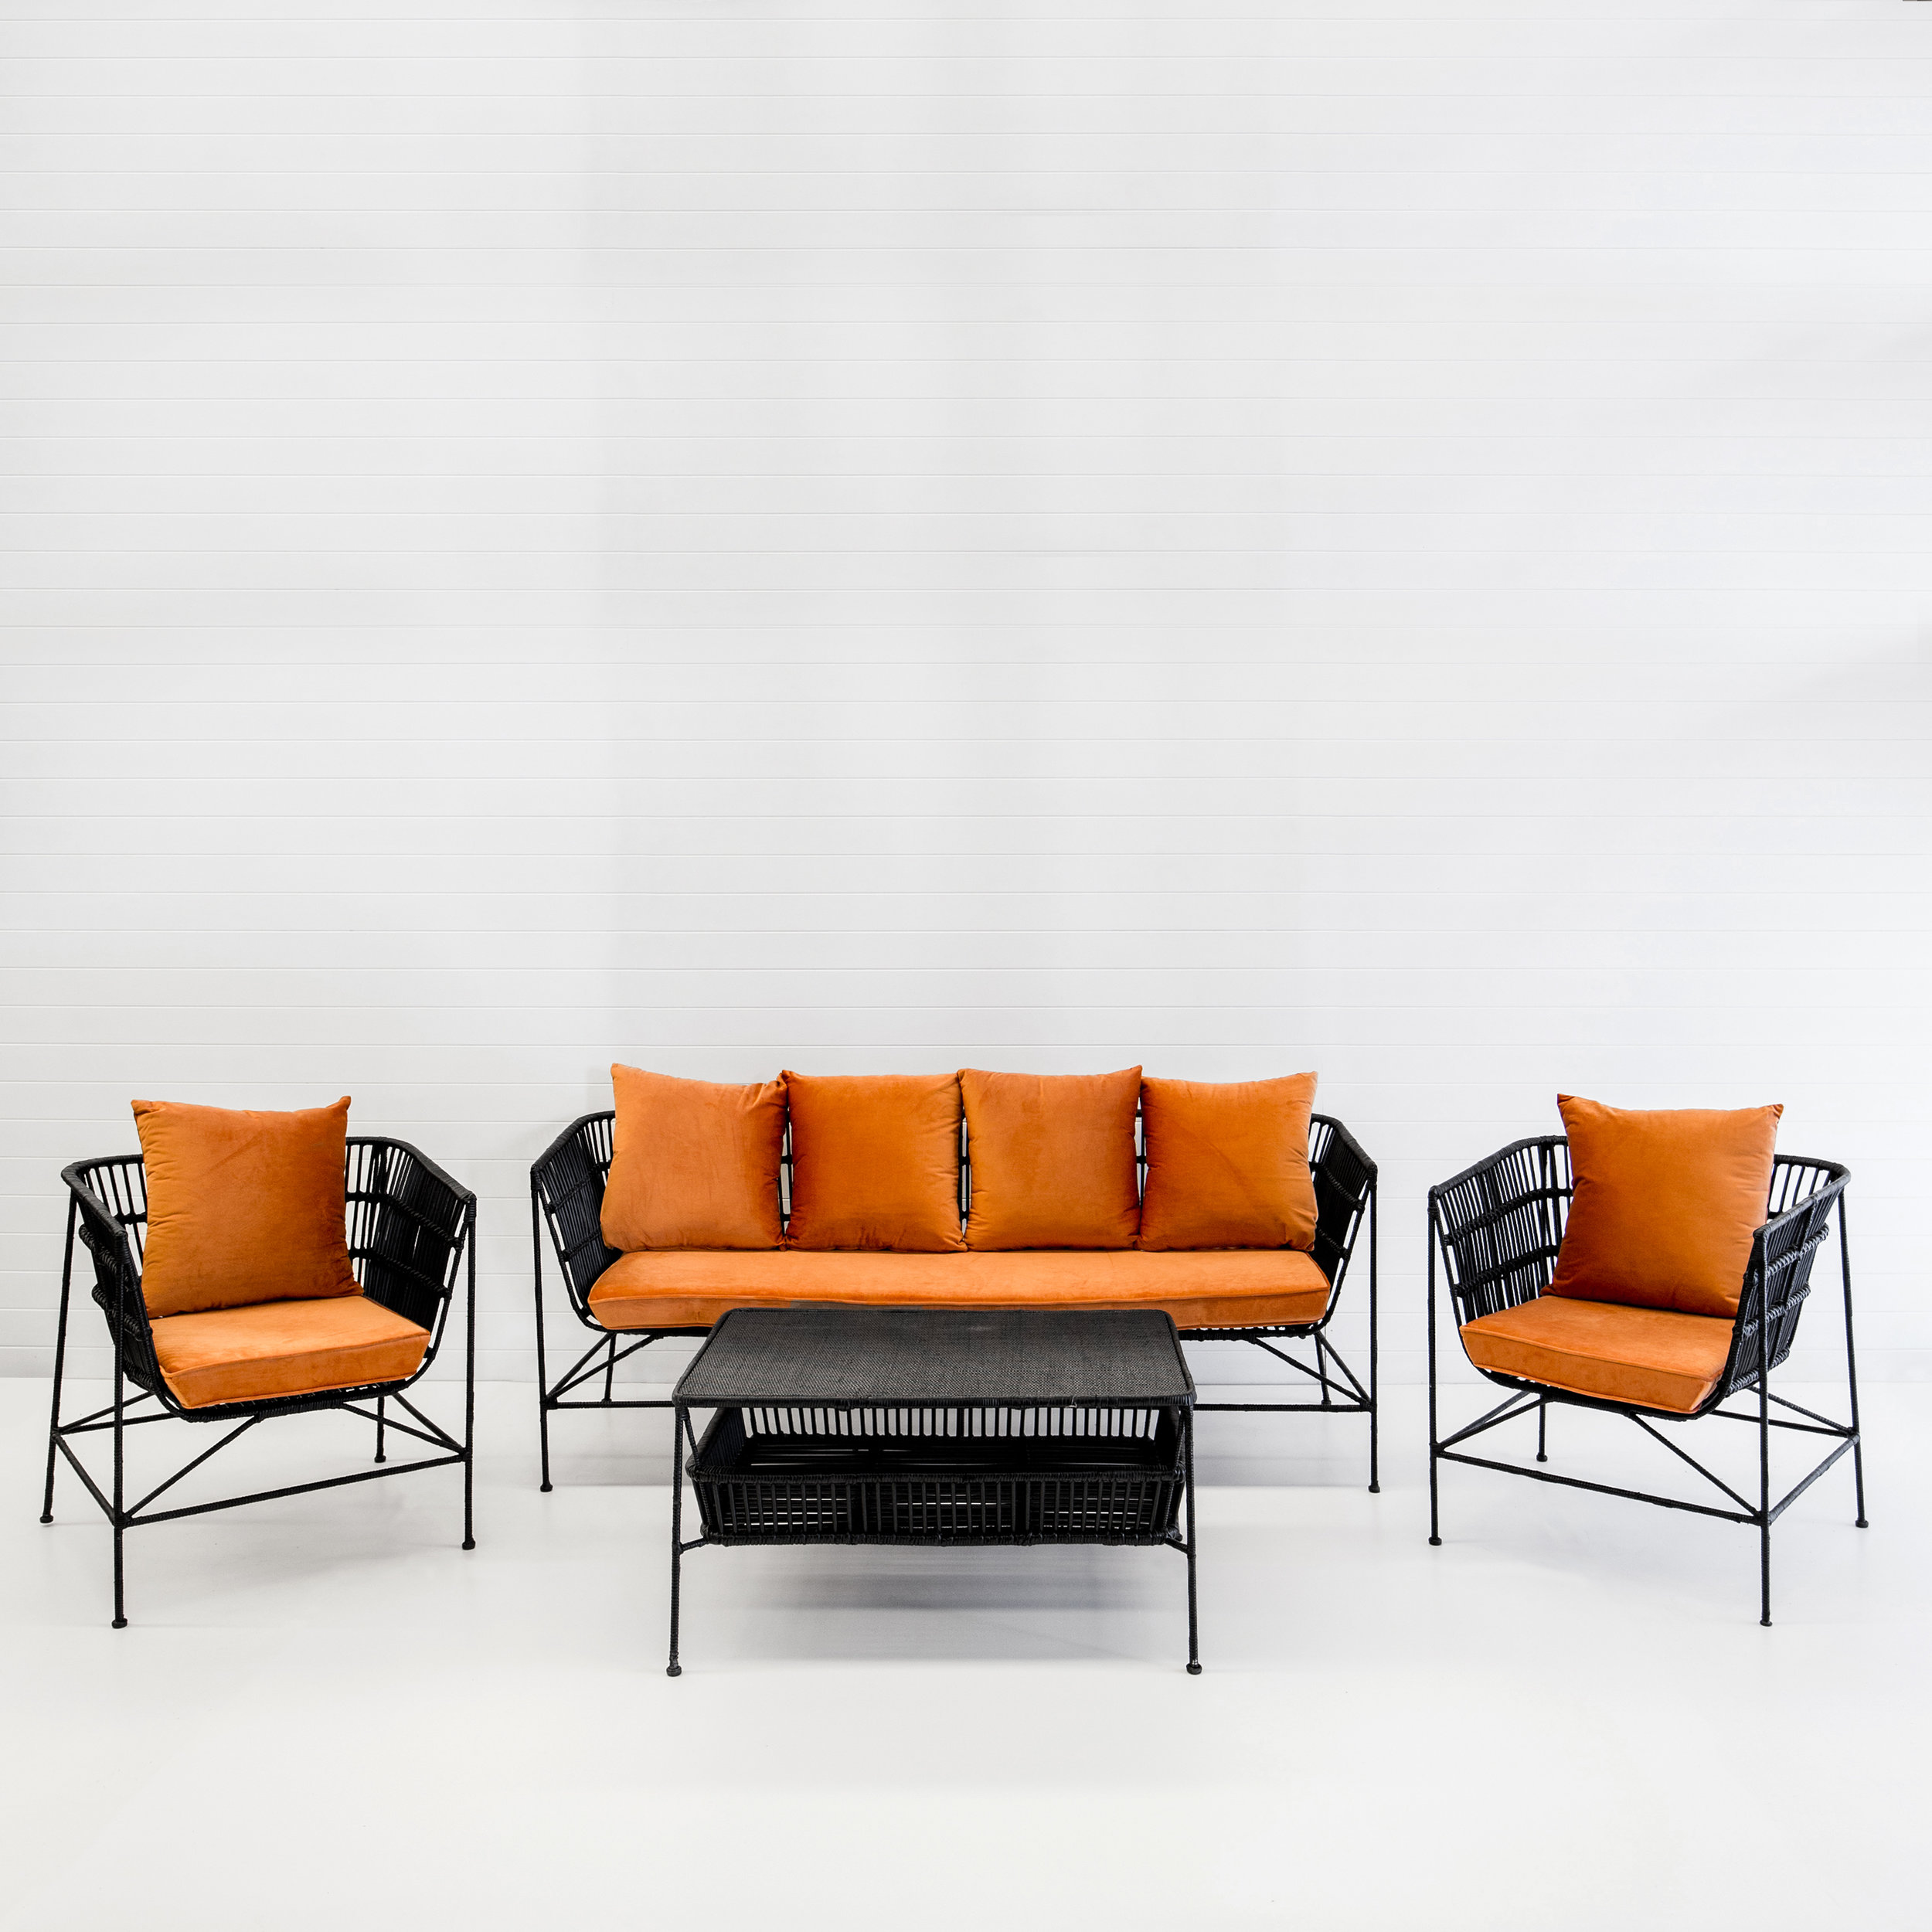 Indie black sofa package with rust velvet cushions